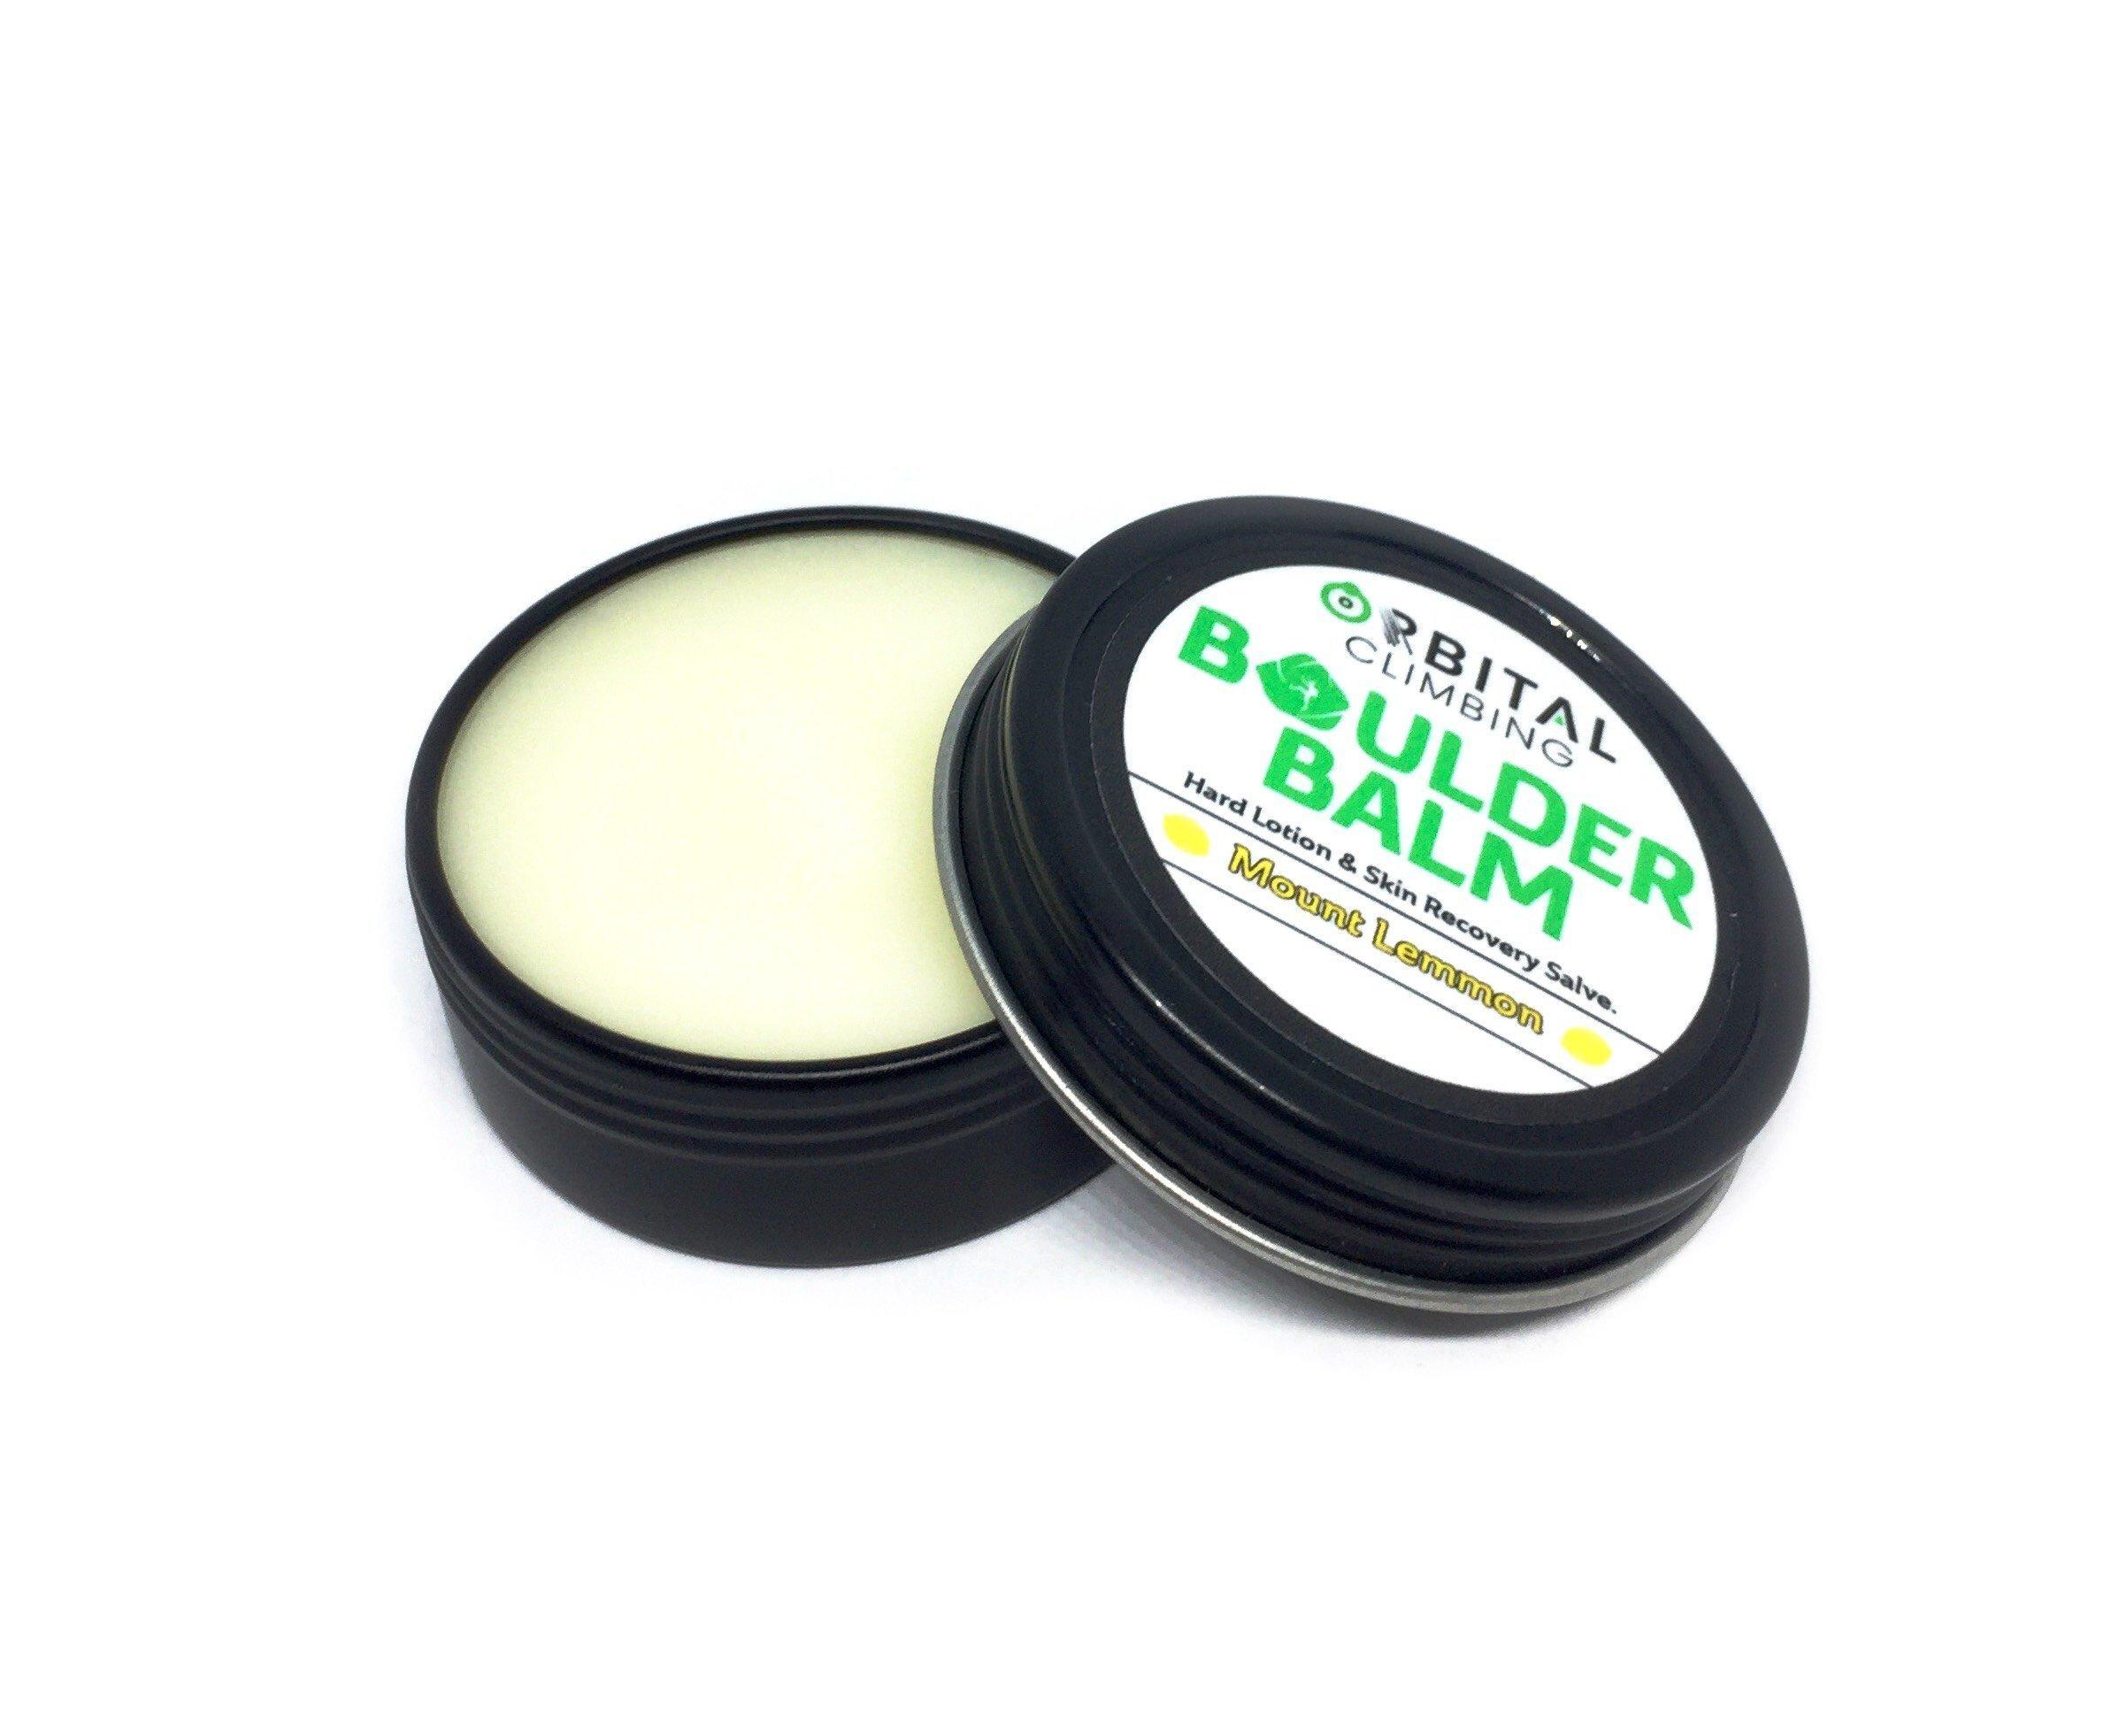 Boulder Balm: Hard Lotion Skin Recovery Salve (Mount Lemmon Scent) 1oz